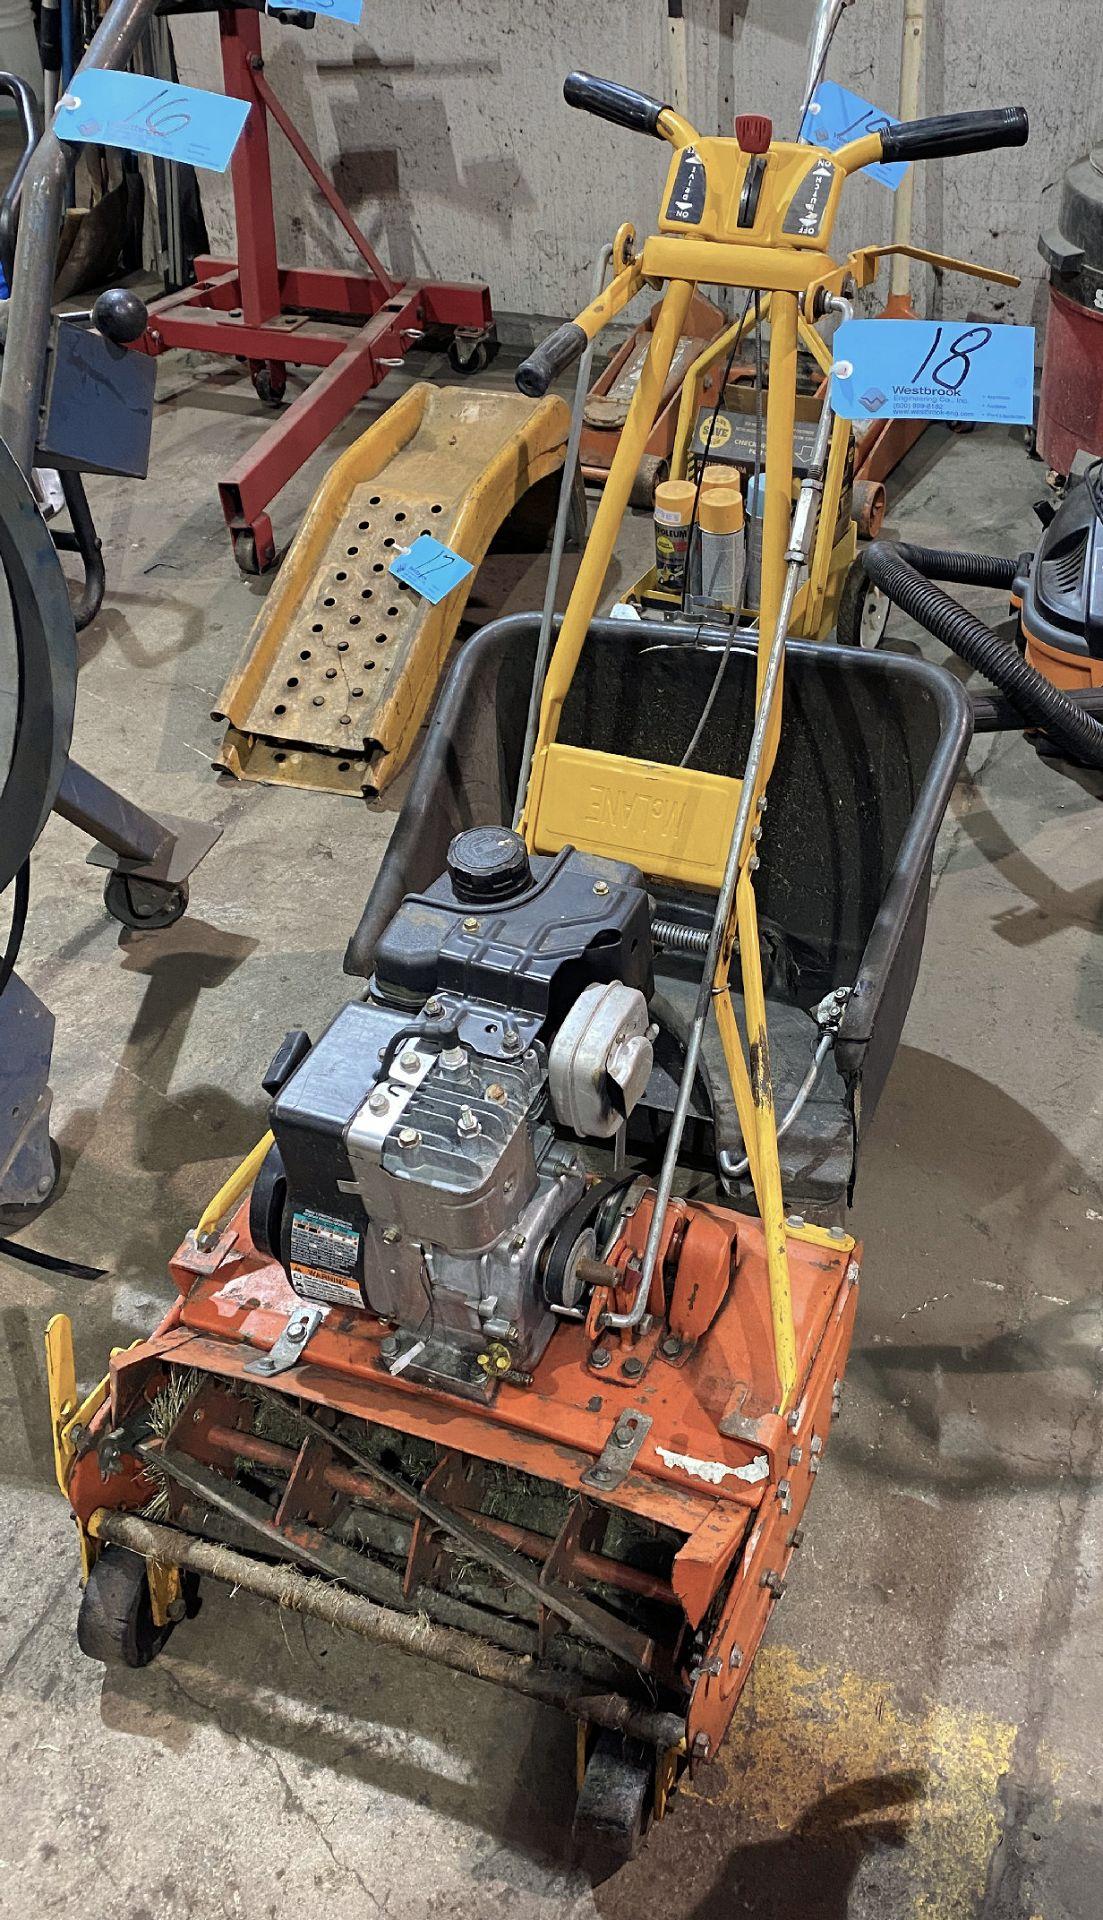 Gas Powered Walk Behind Lawn Mower, Briggs & Stratton 3.5-HP Motor